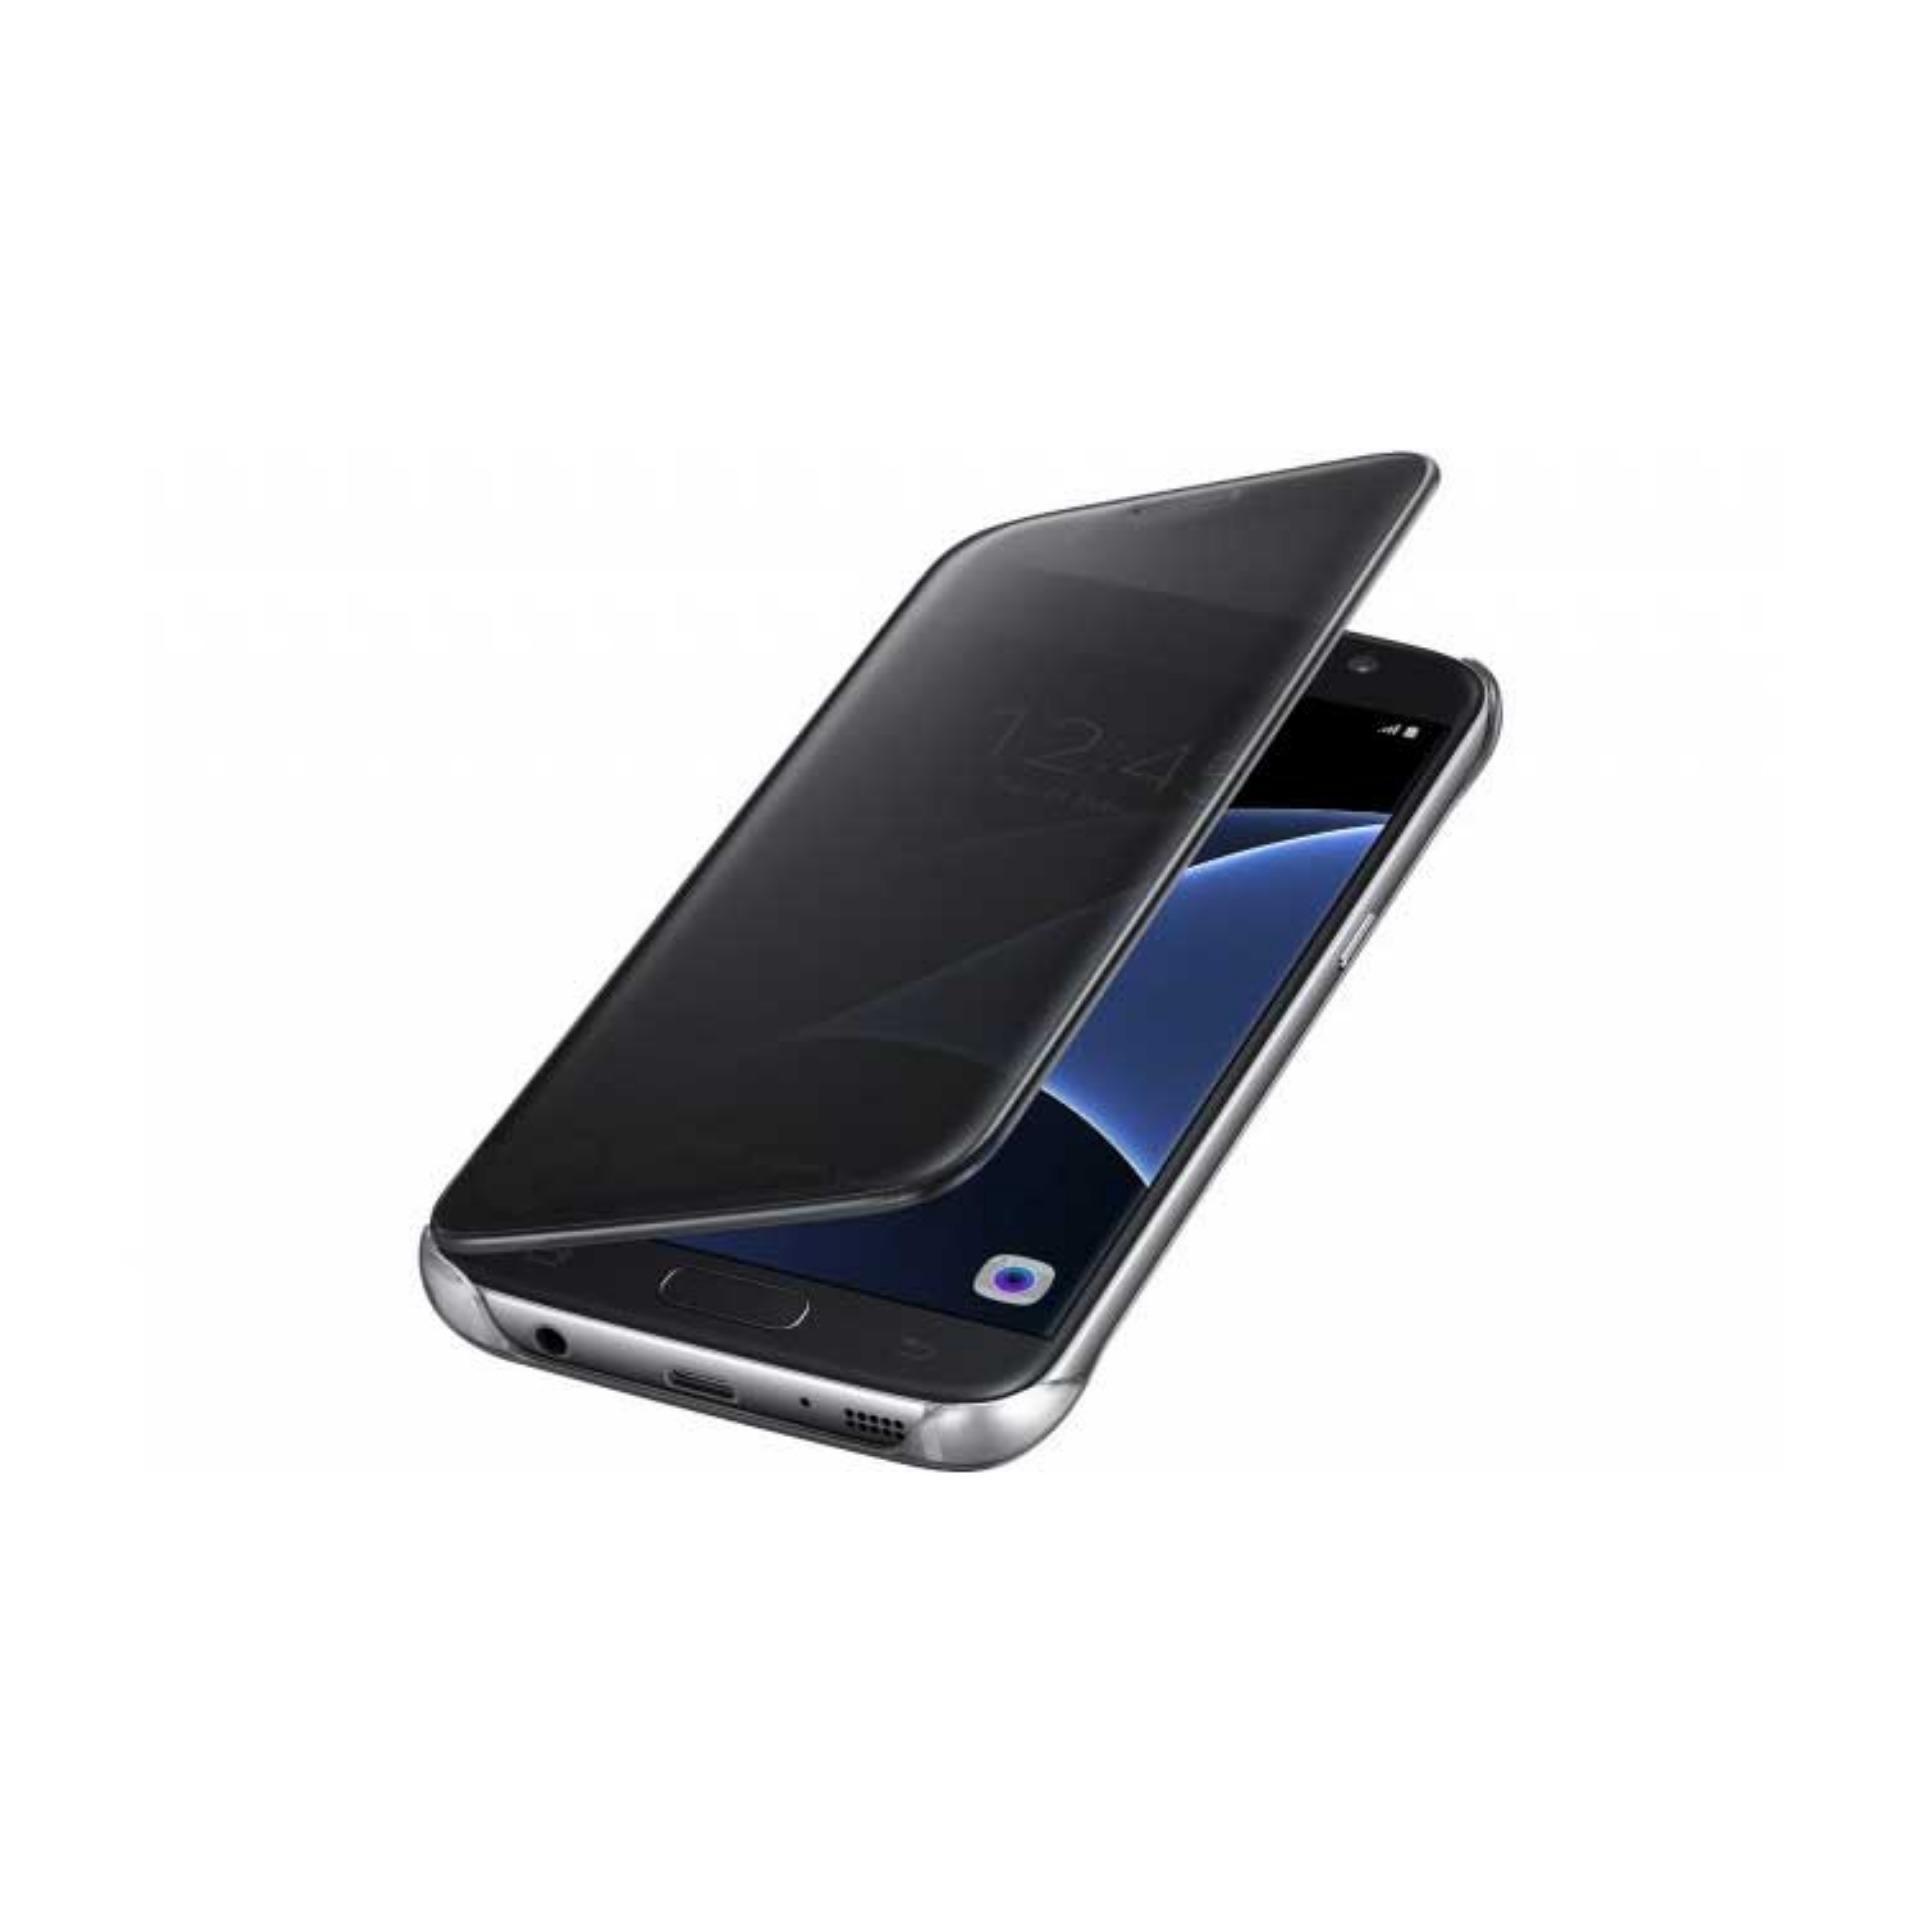 Executive Chanel Case Samsung Galaxy J7 Prime Flipcase Flip MirrorCover S View Transparan Auto Lock Casing